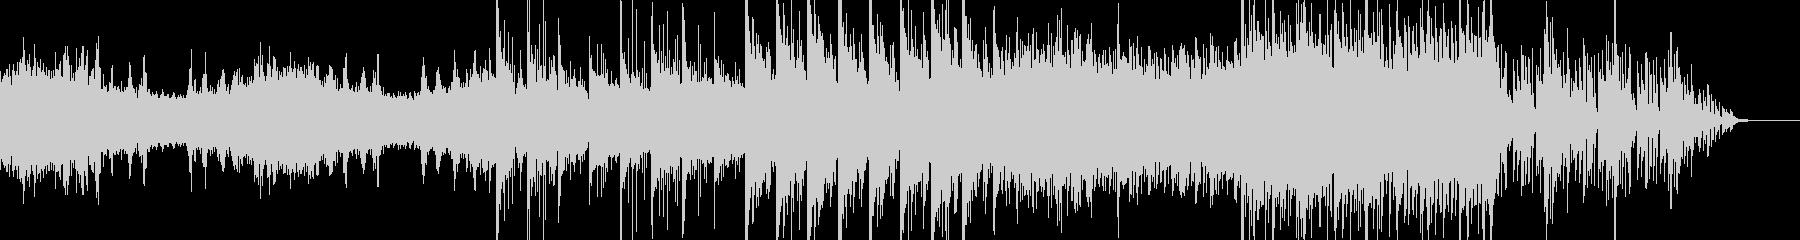 映像、背景的音楽ー湿地帯の未再生の波形